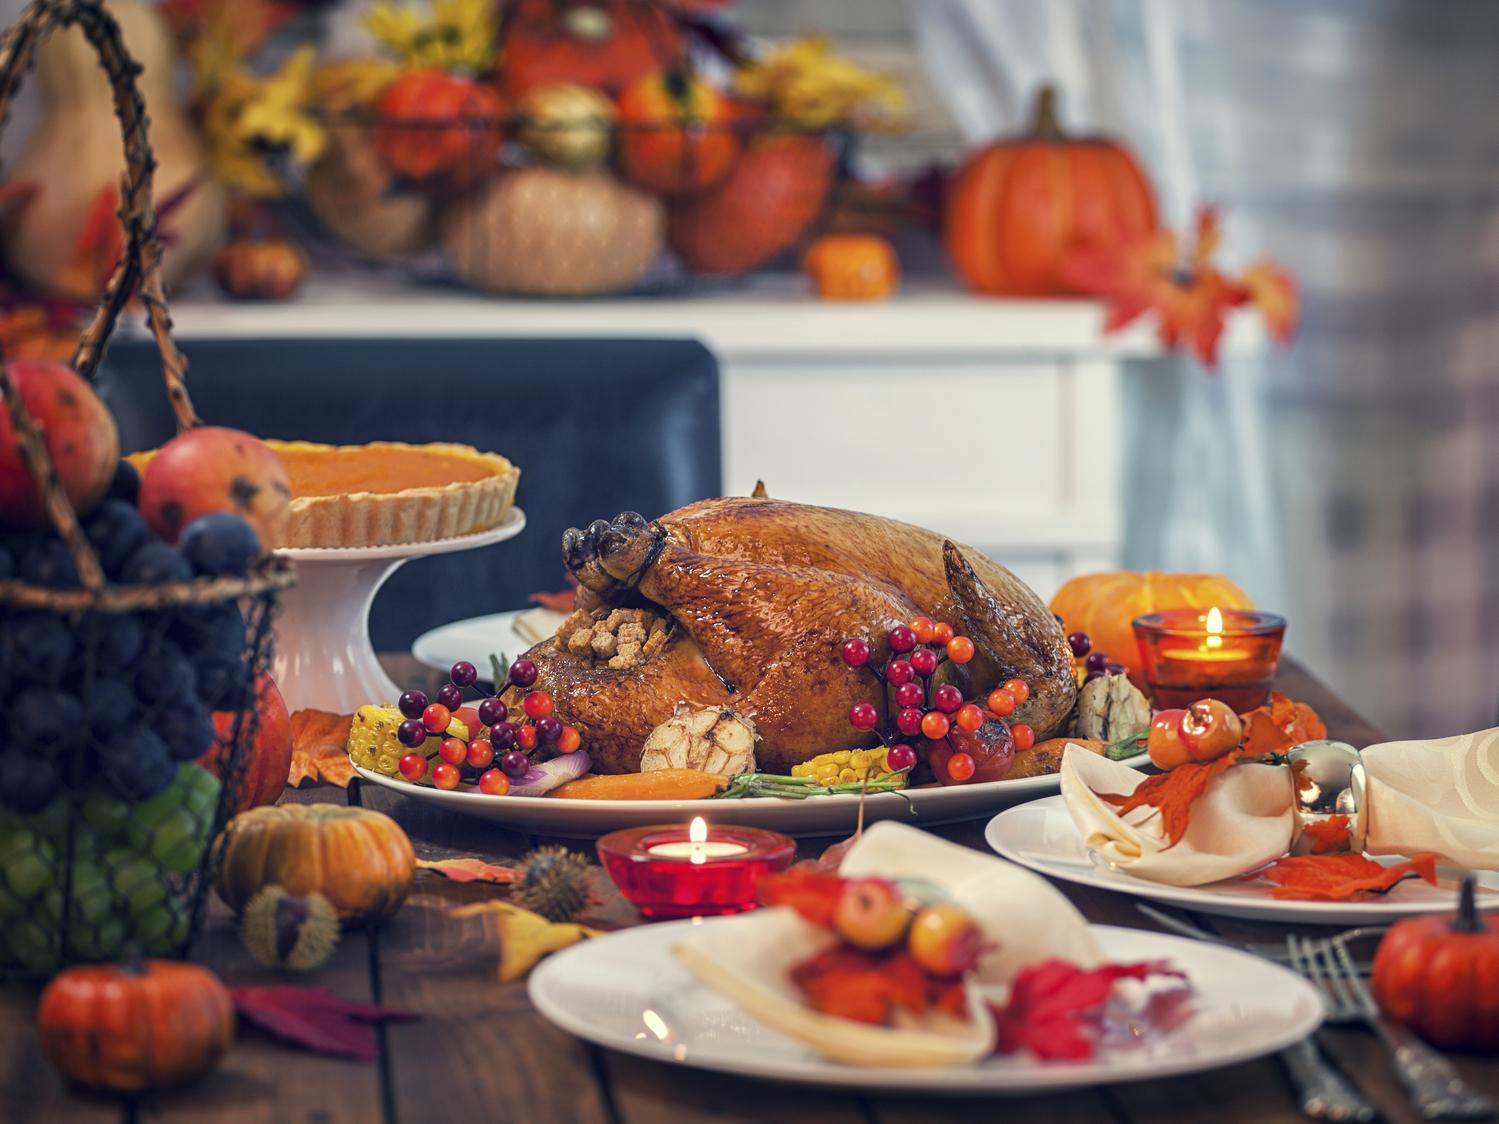 Thanksgiving Dinner: 5 Easy Ways to SaveCalories forecasting